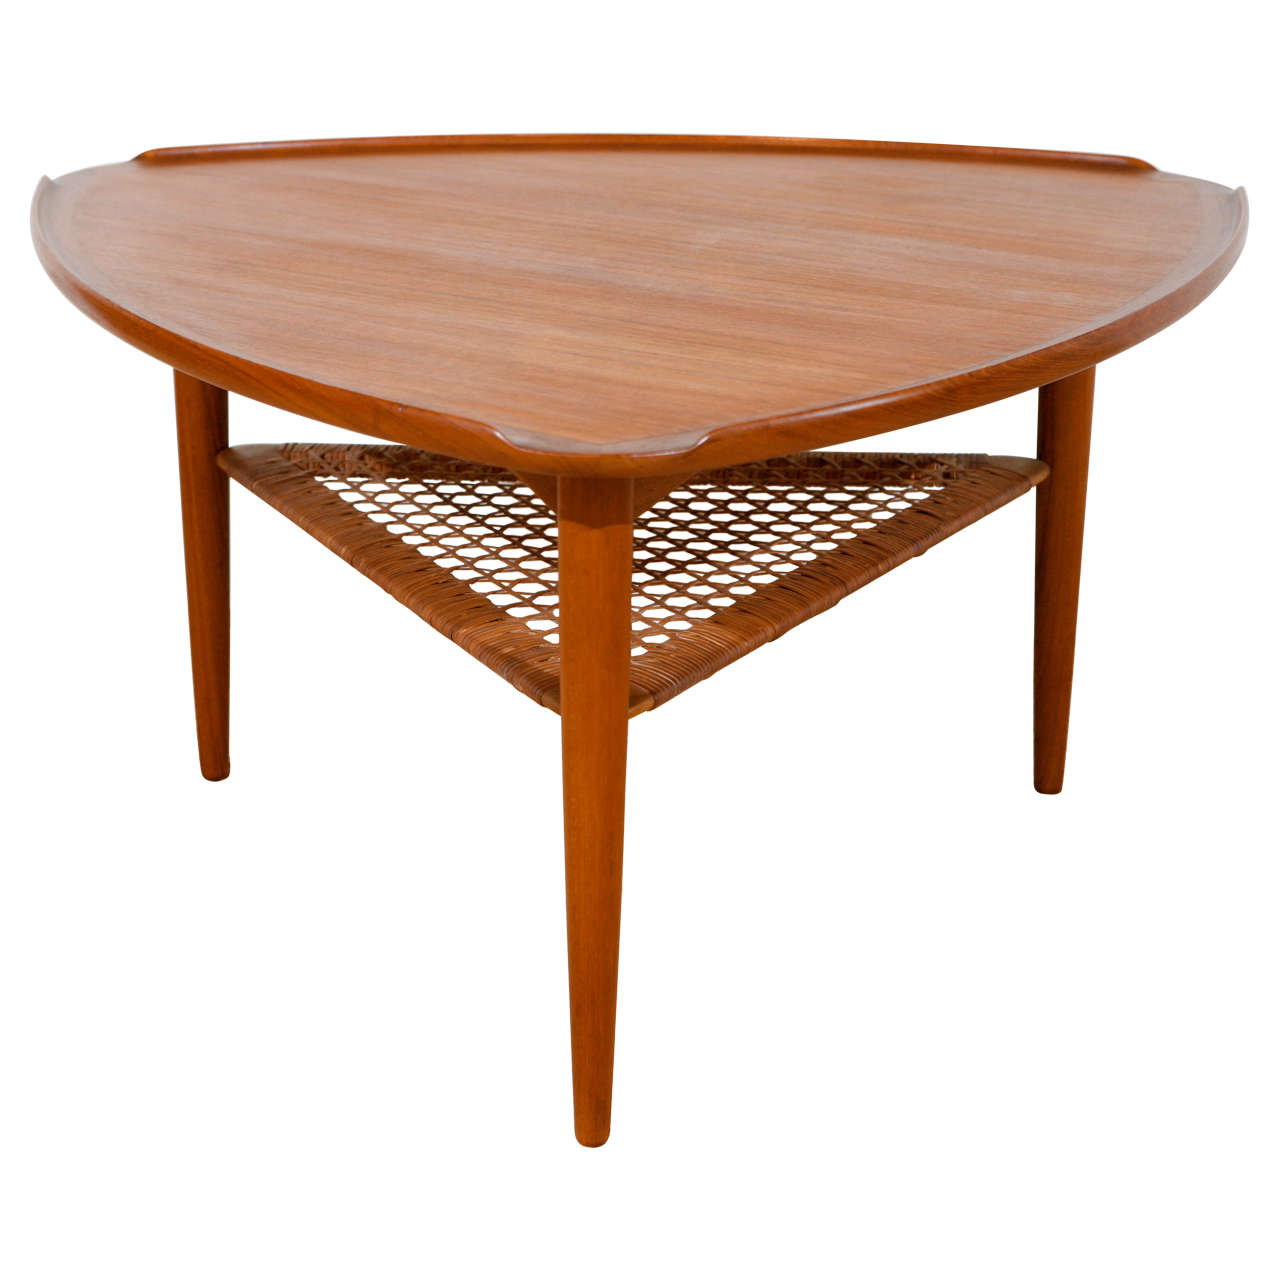 poul jensen guitar pick coffee table at 1stdibs. Black Bedroom Furniture Sets. Home Design Ideas